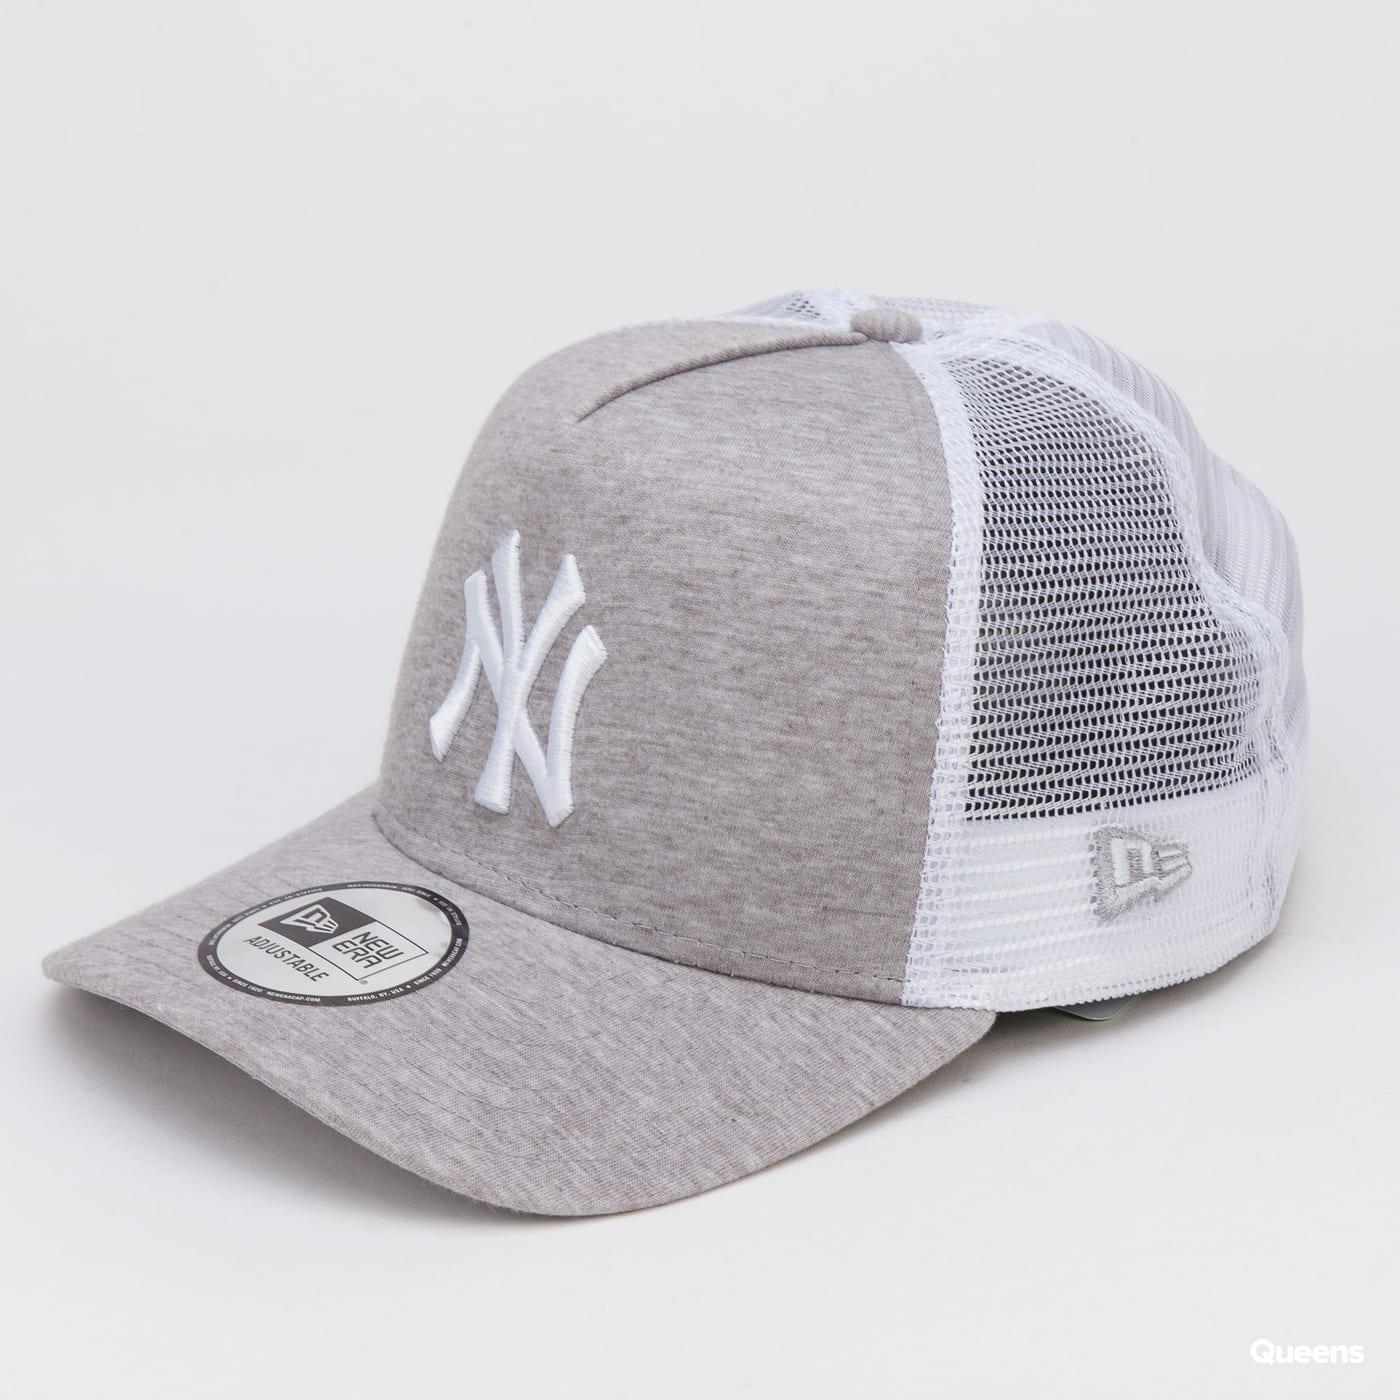 New Era 940 MLB Jersey Essential AF Trucker NY melange gray / white / gray